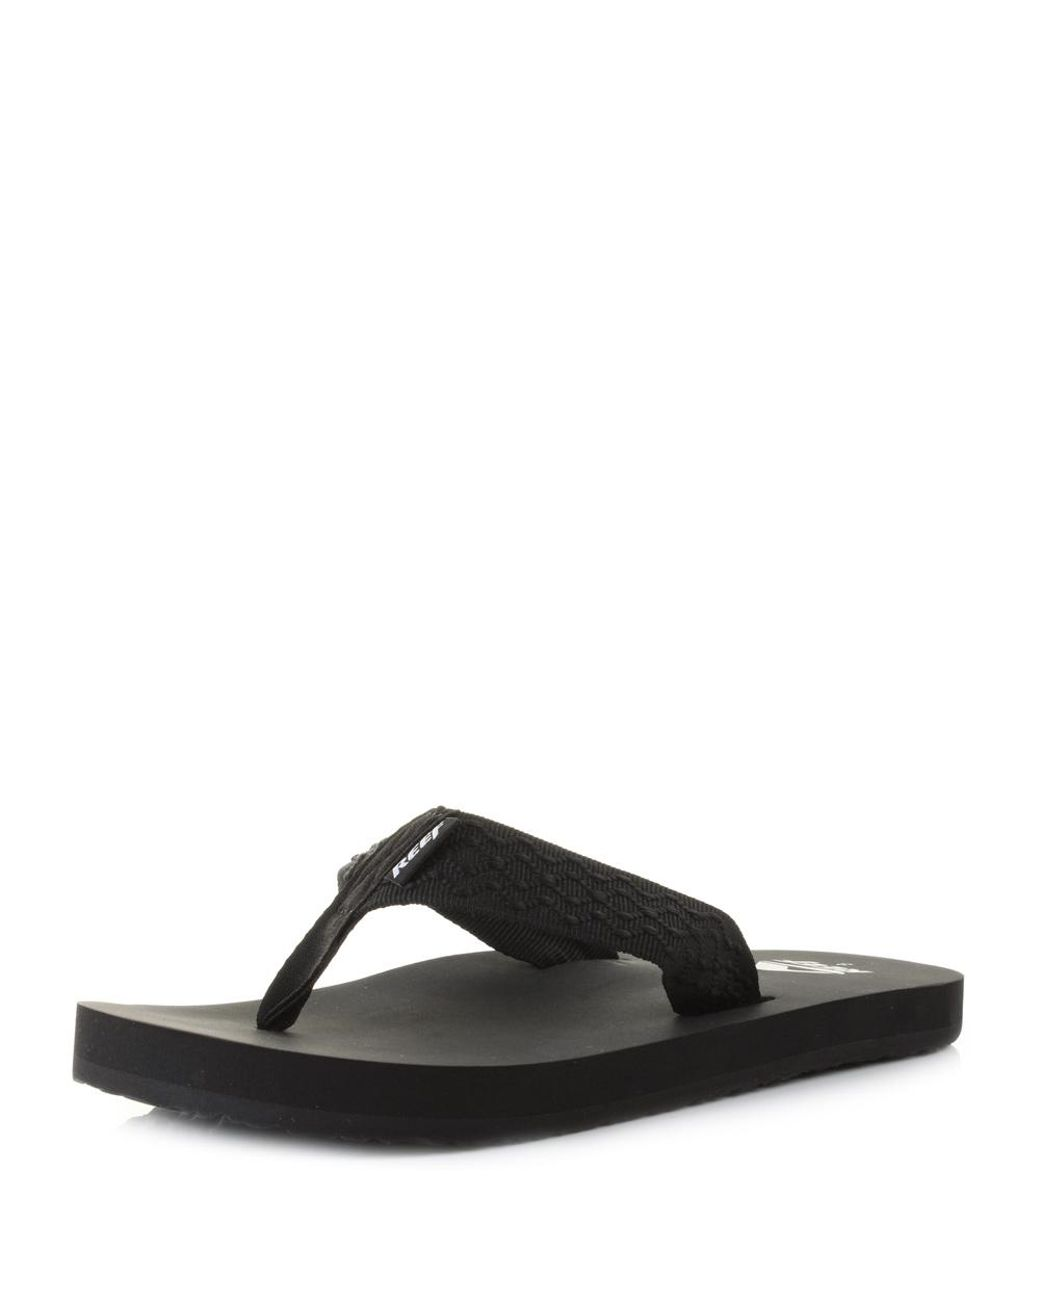 12b49009f38e Reef Smoothy Flip Flops in Black for Men - Lyst